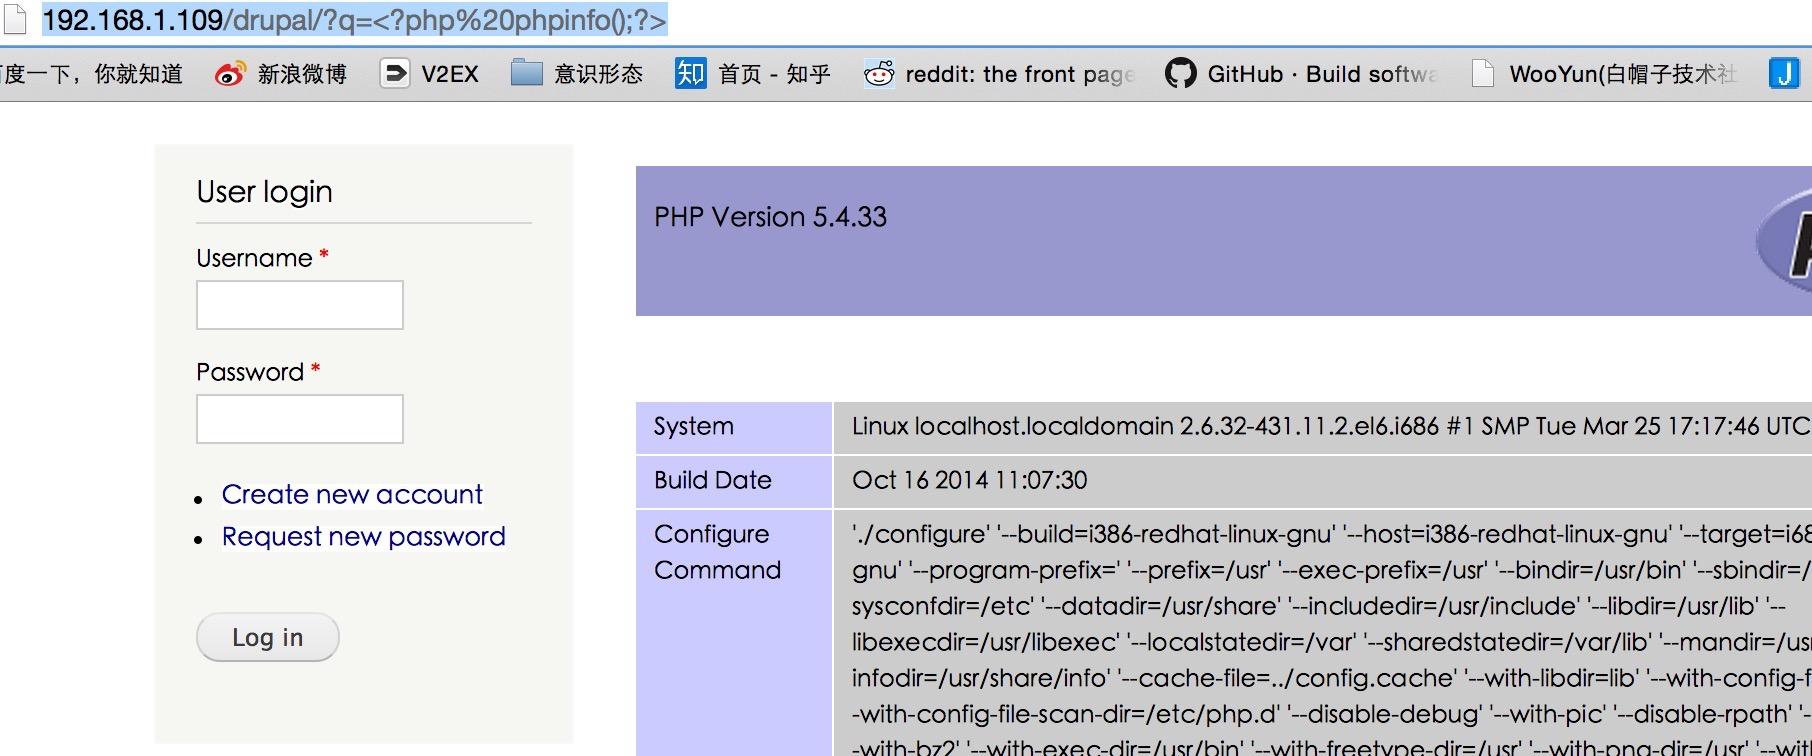 callback噩梦:解析著名CMS框架Drupal SQL注入漏洞